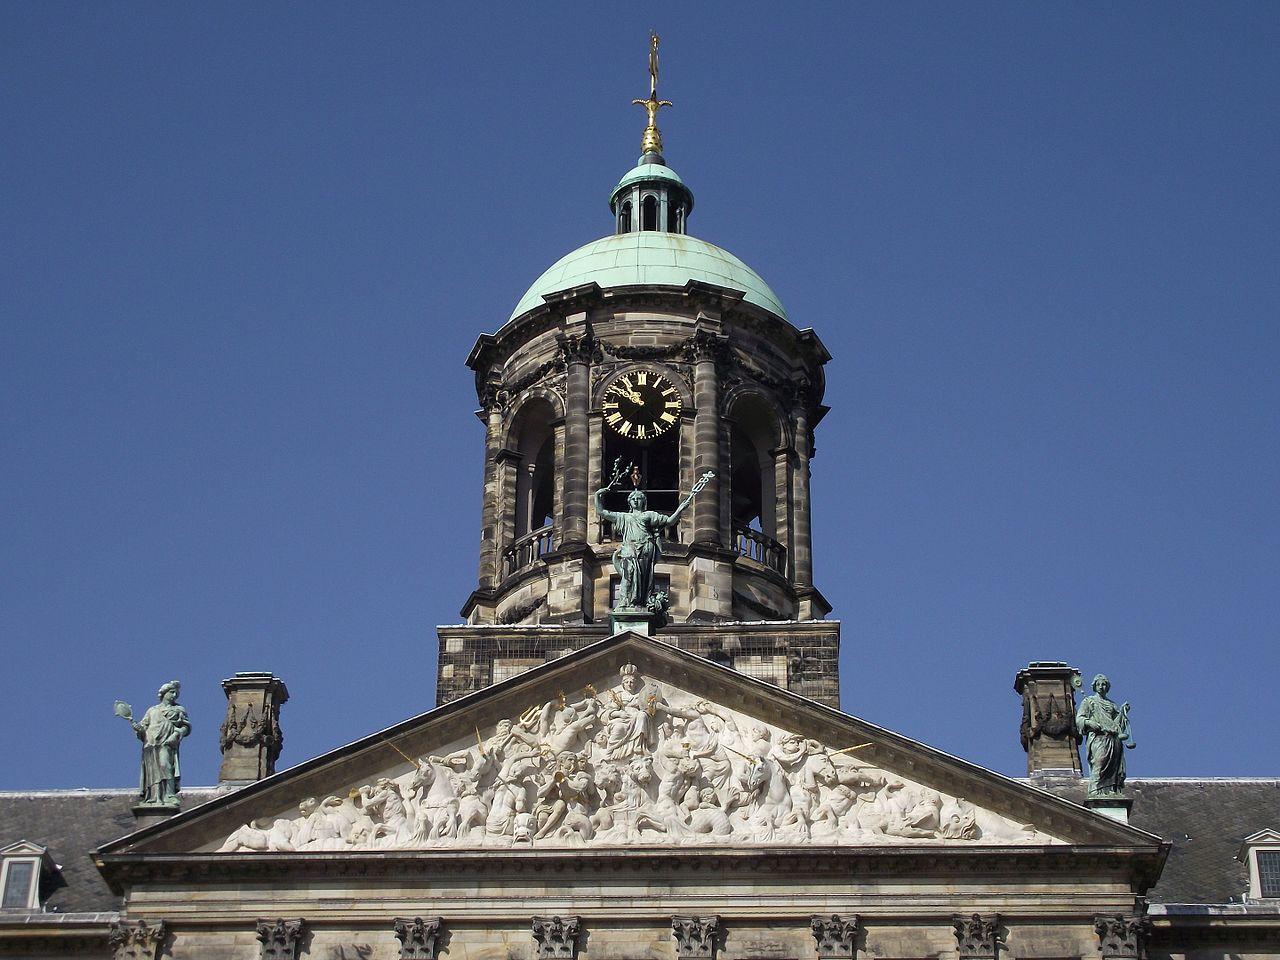 Королевский дворец в Амстердаме, башня с часами